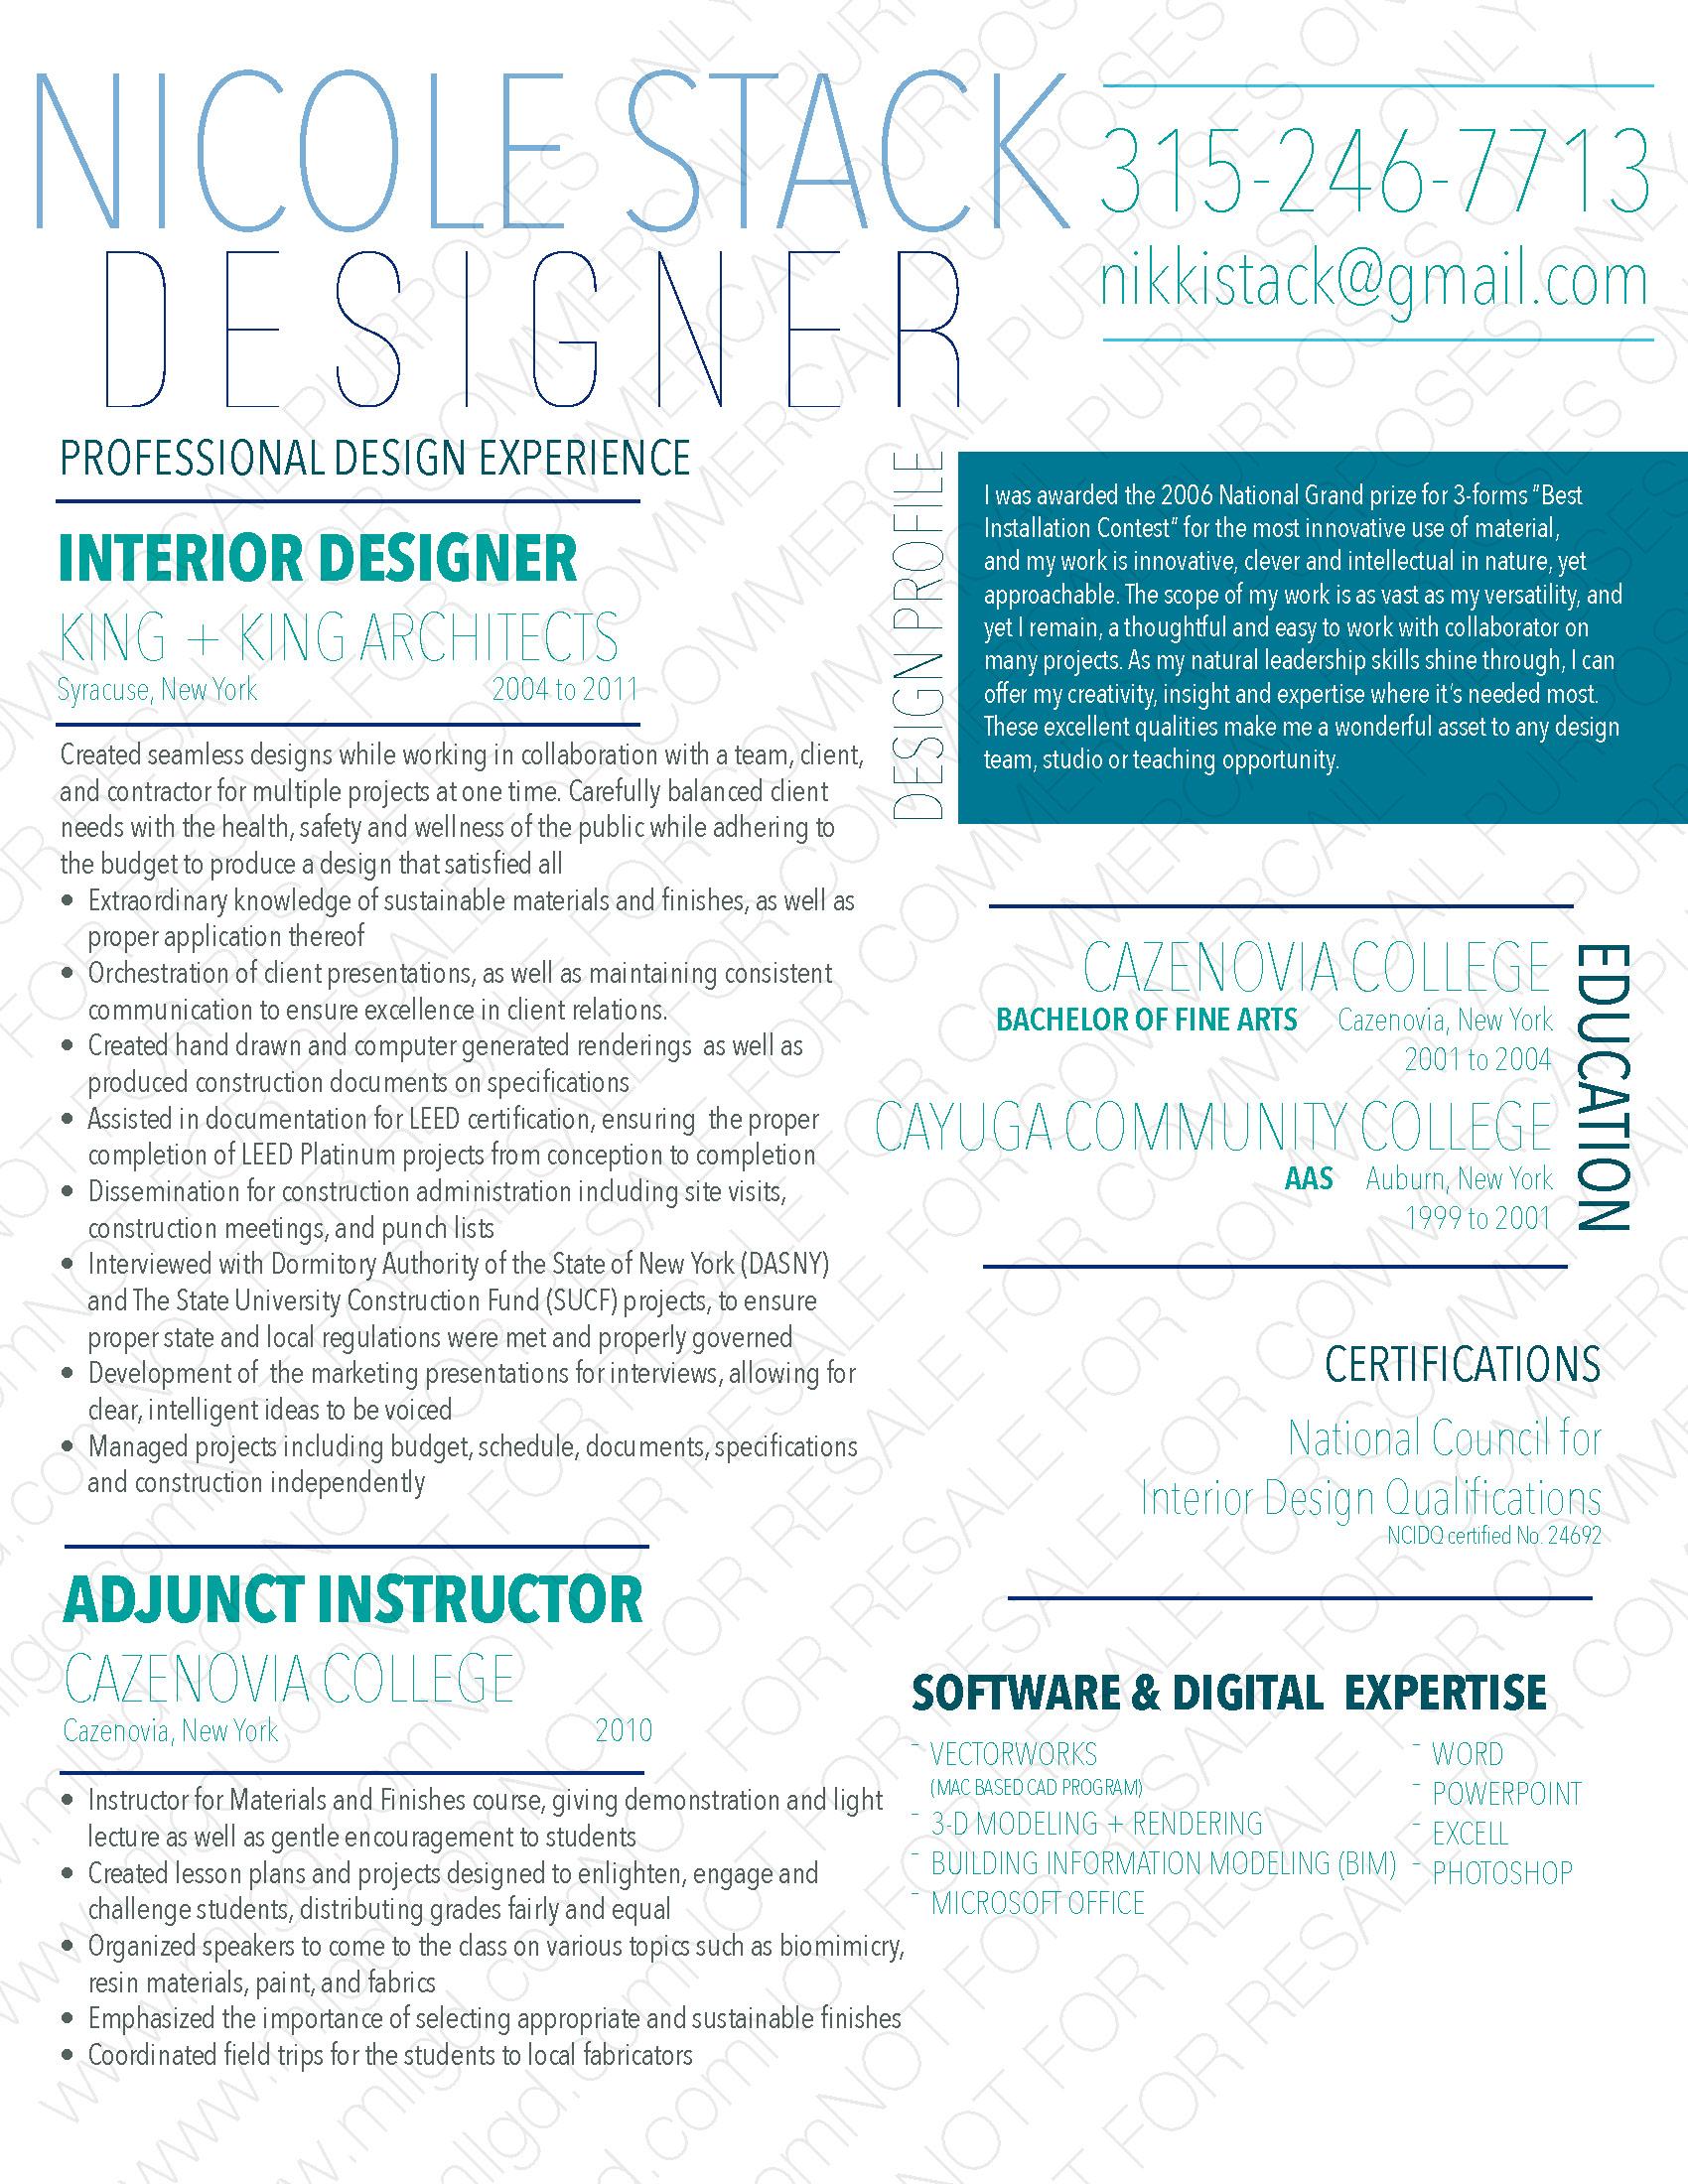 MLL_Resume_Design_2014_Page_10.jpg